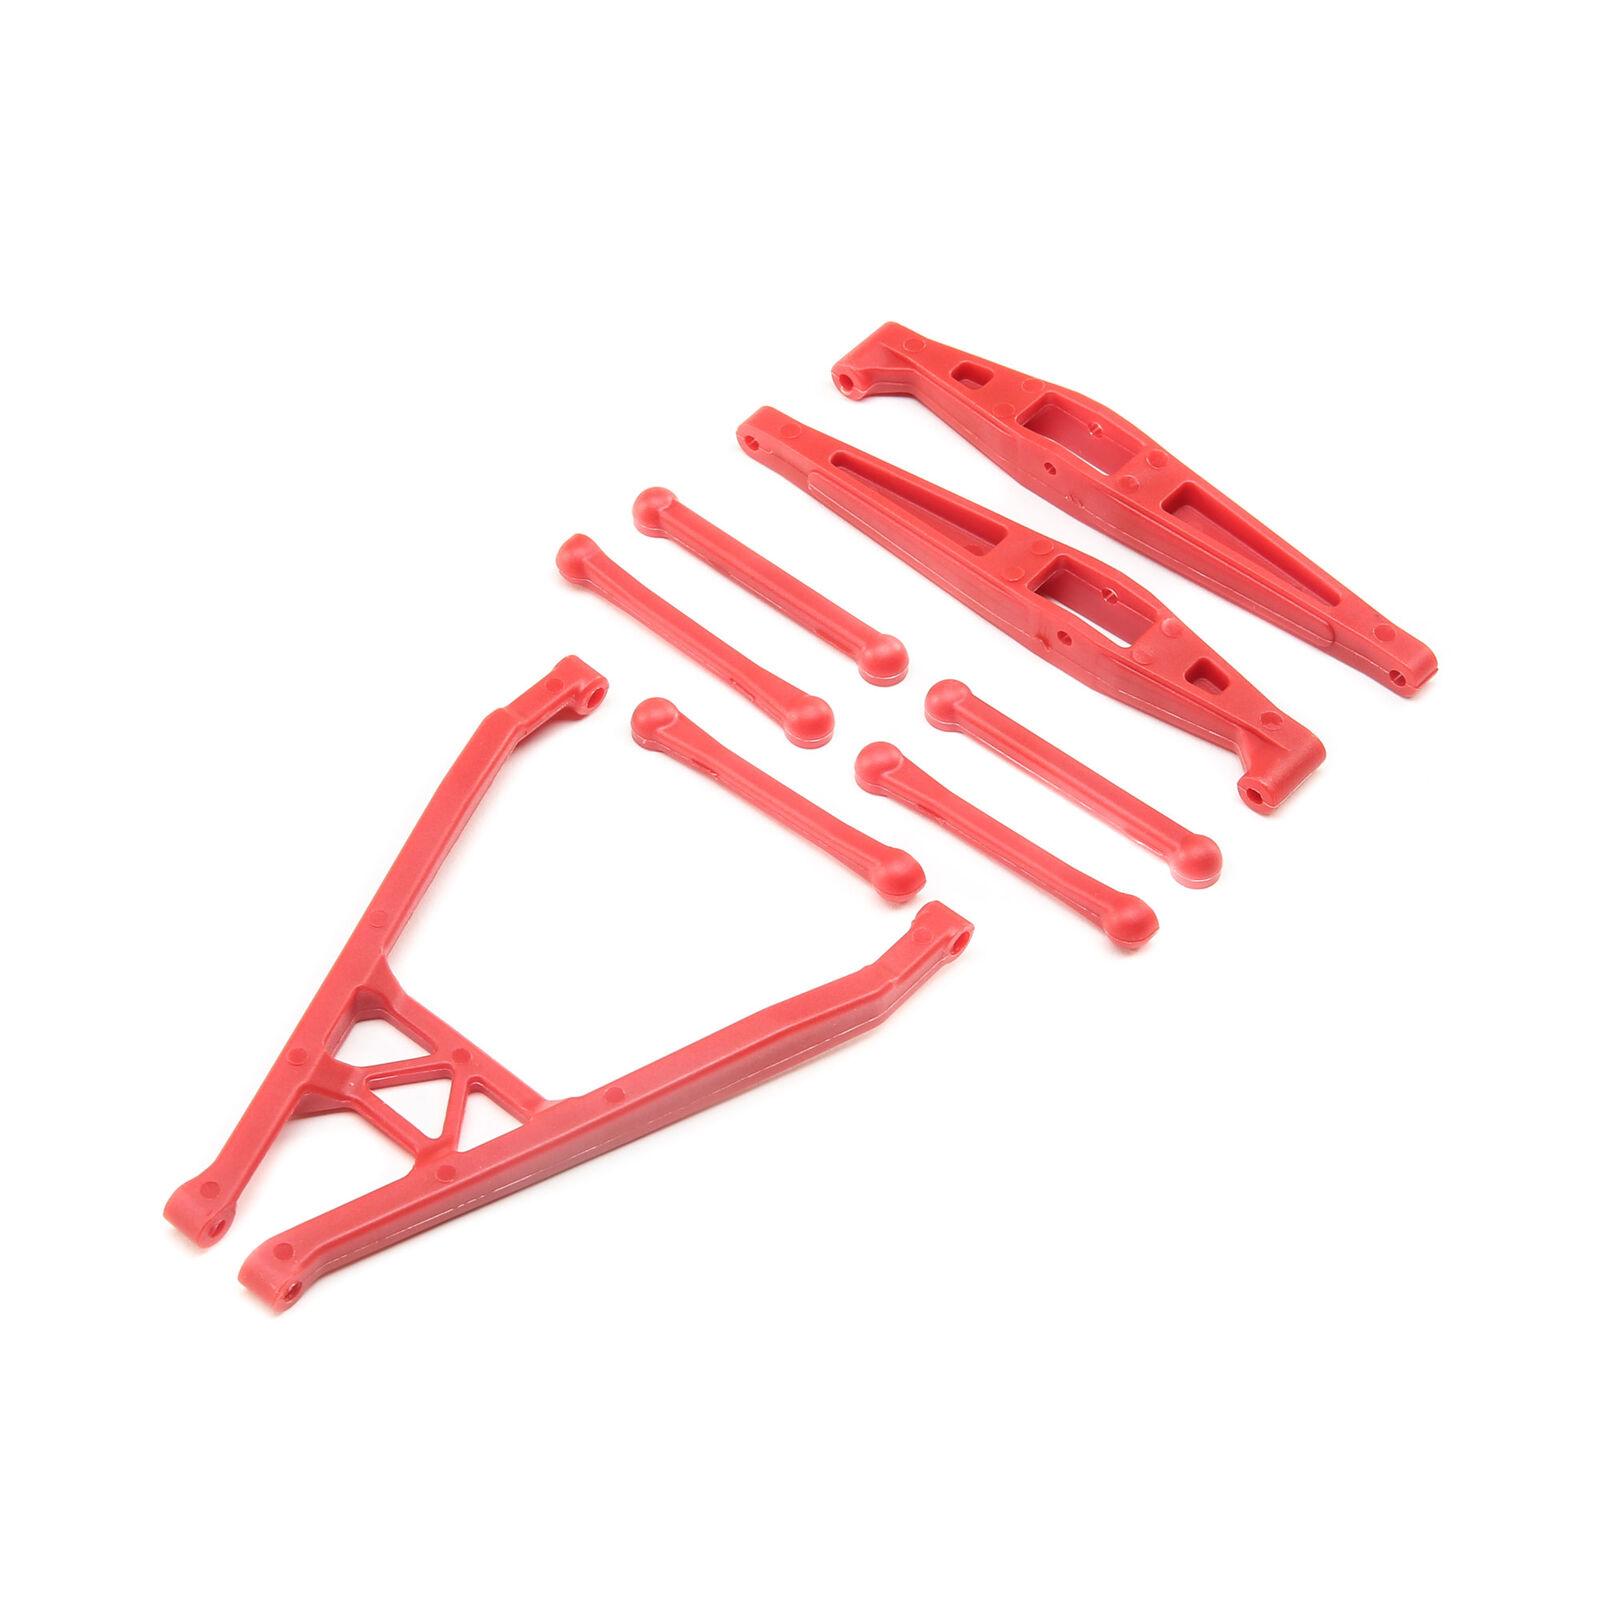 Rear Axle Link Set, Red: Yeti Jr